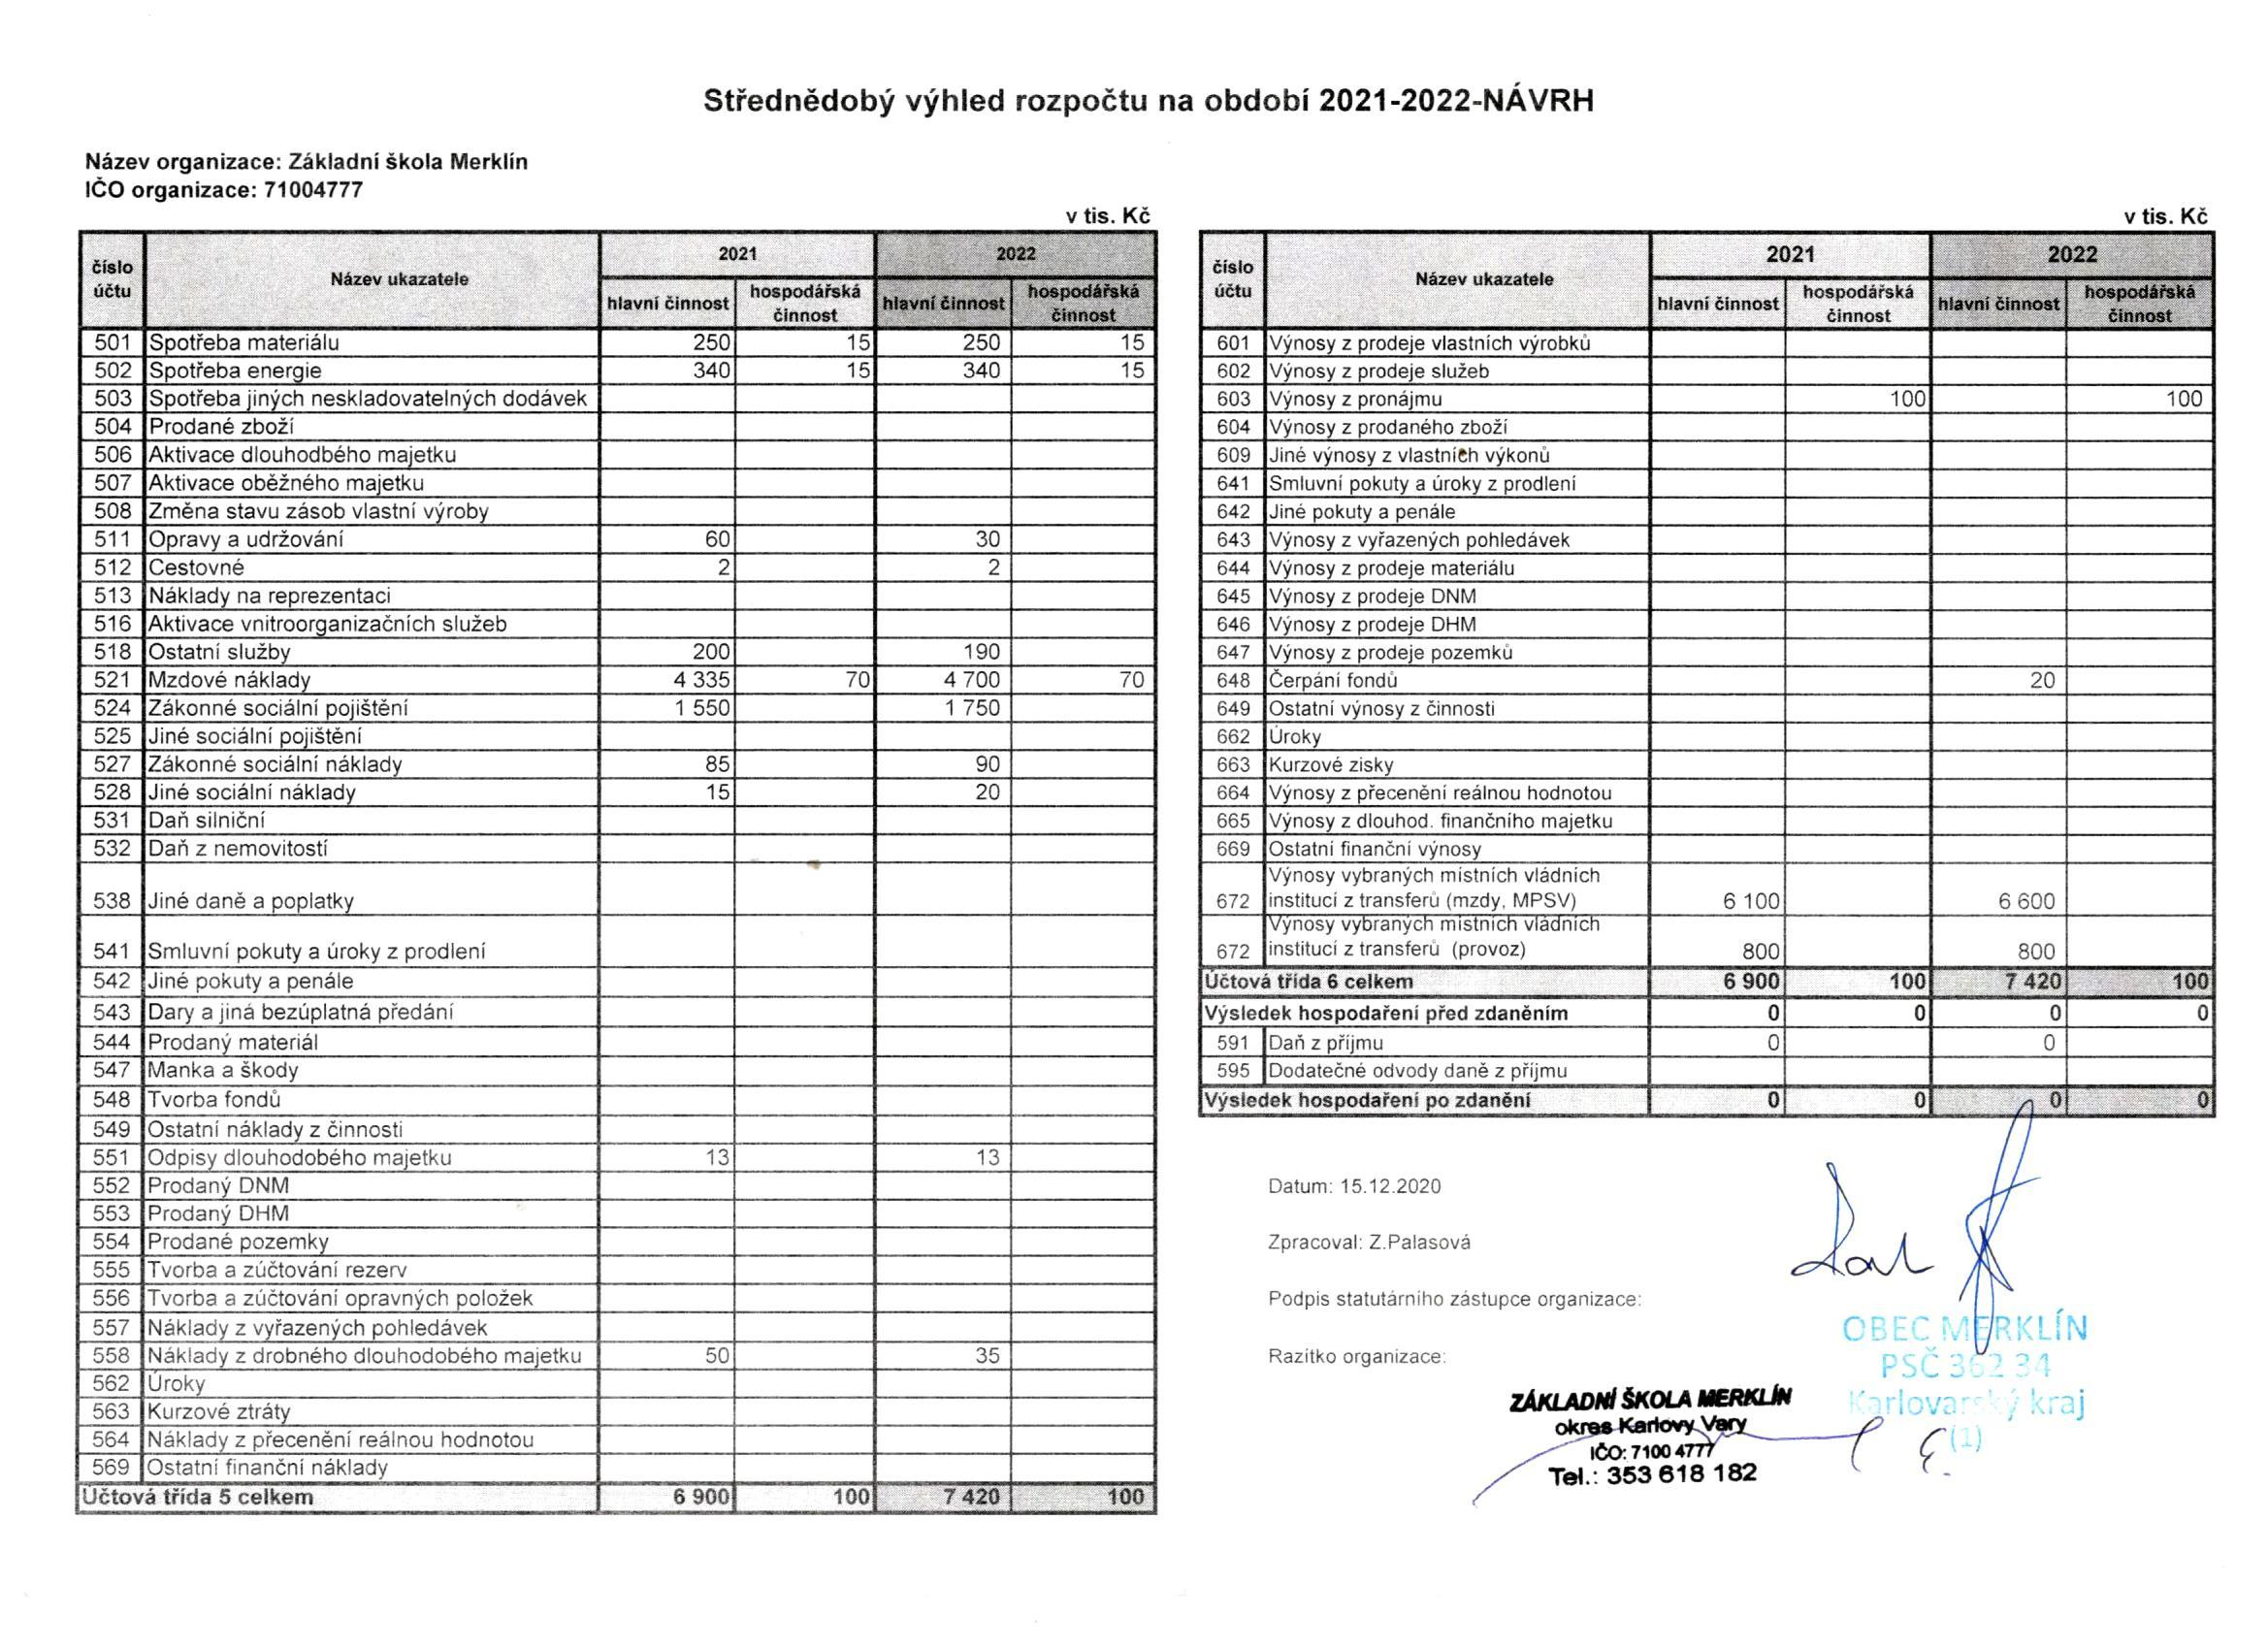 Rozpočet 2021